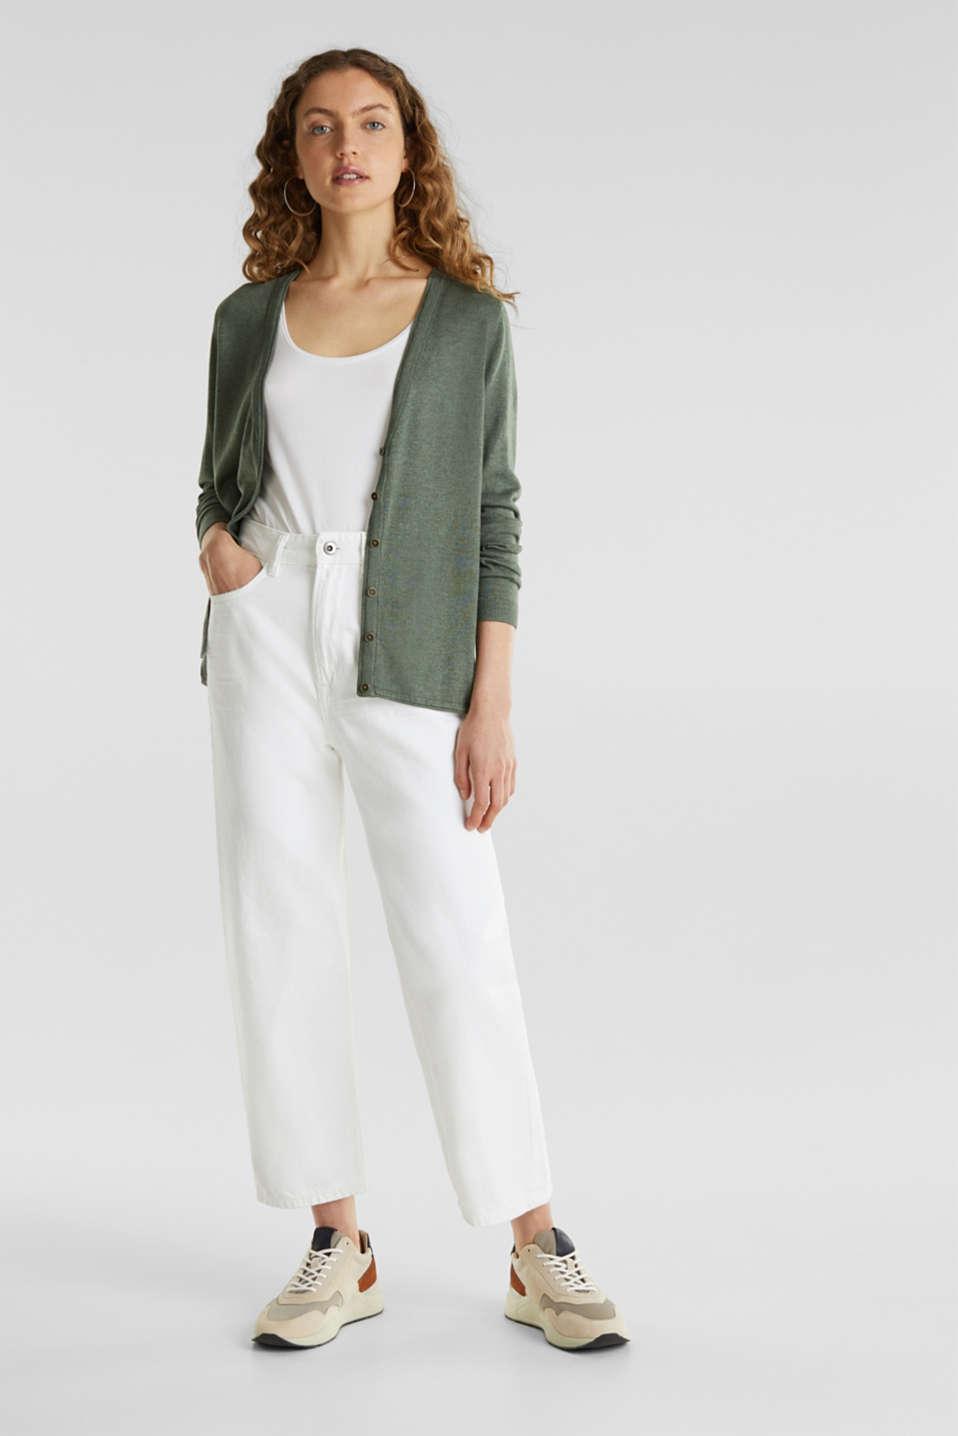 Fine-knit blended cotton cardigan, KHAKI GREEN 5, detail image number 1